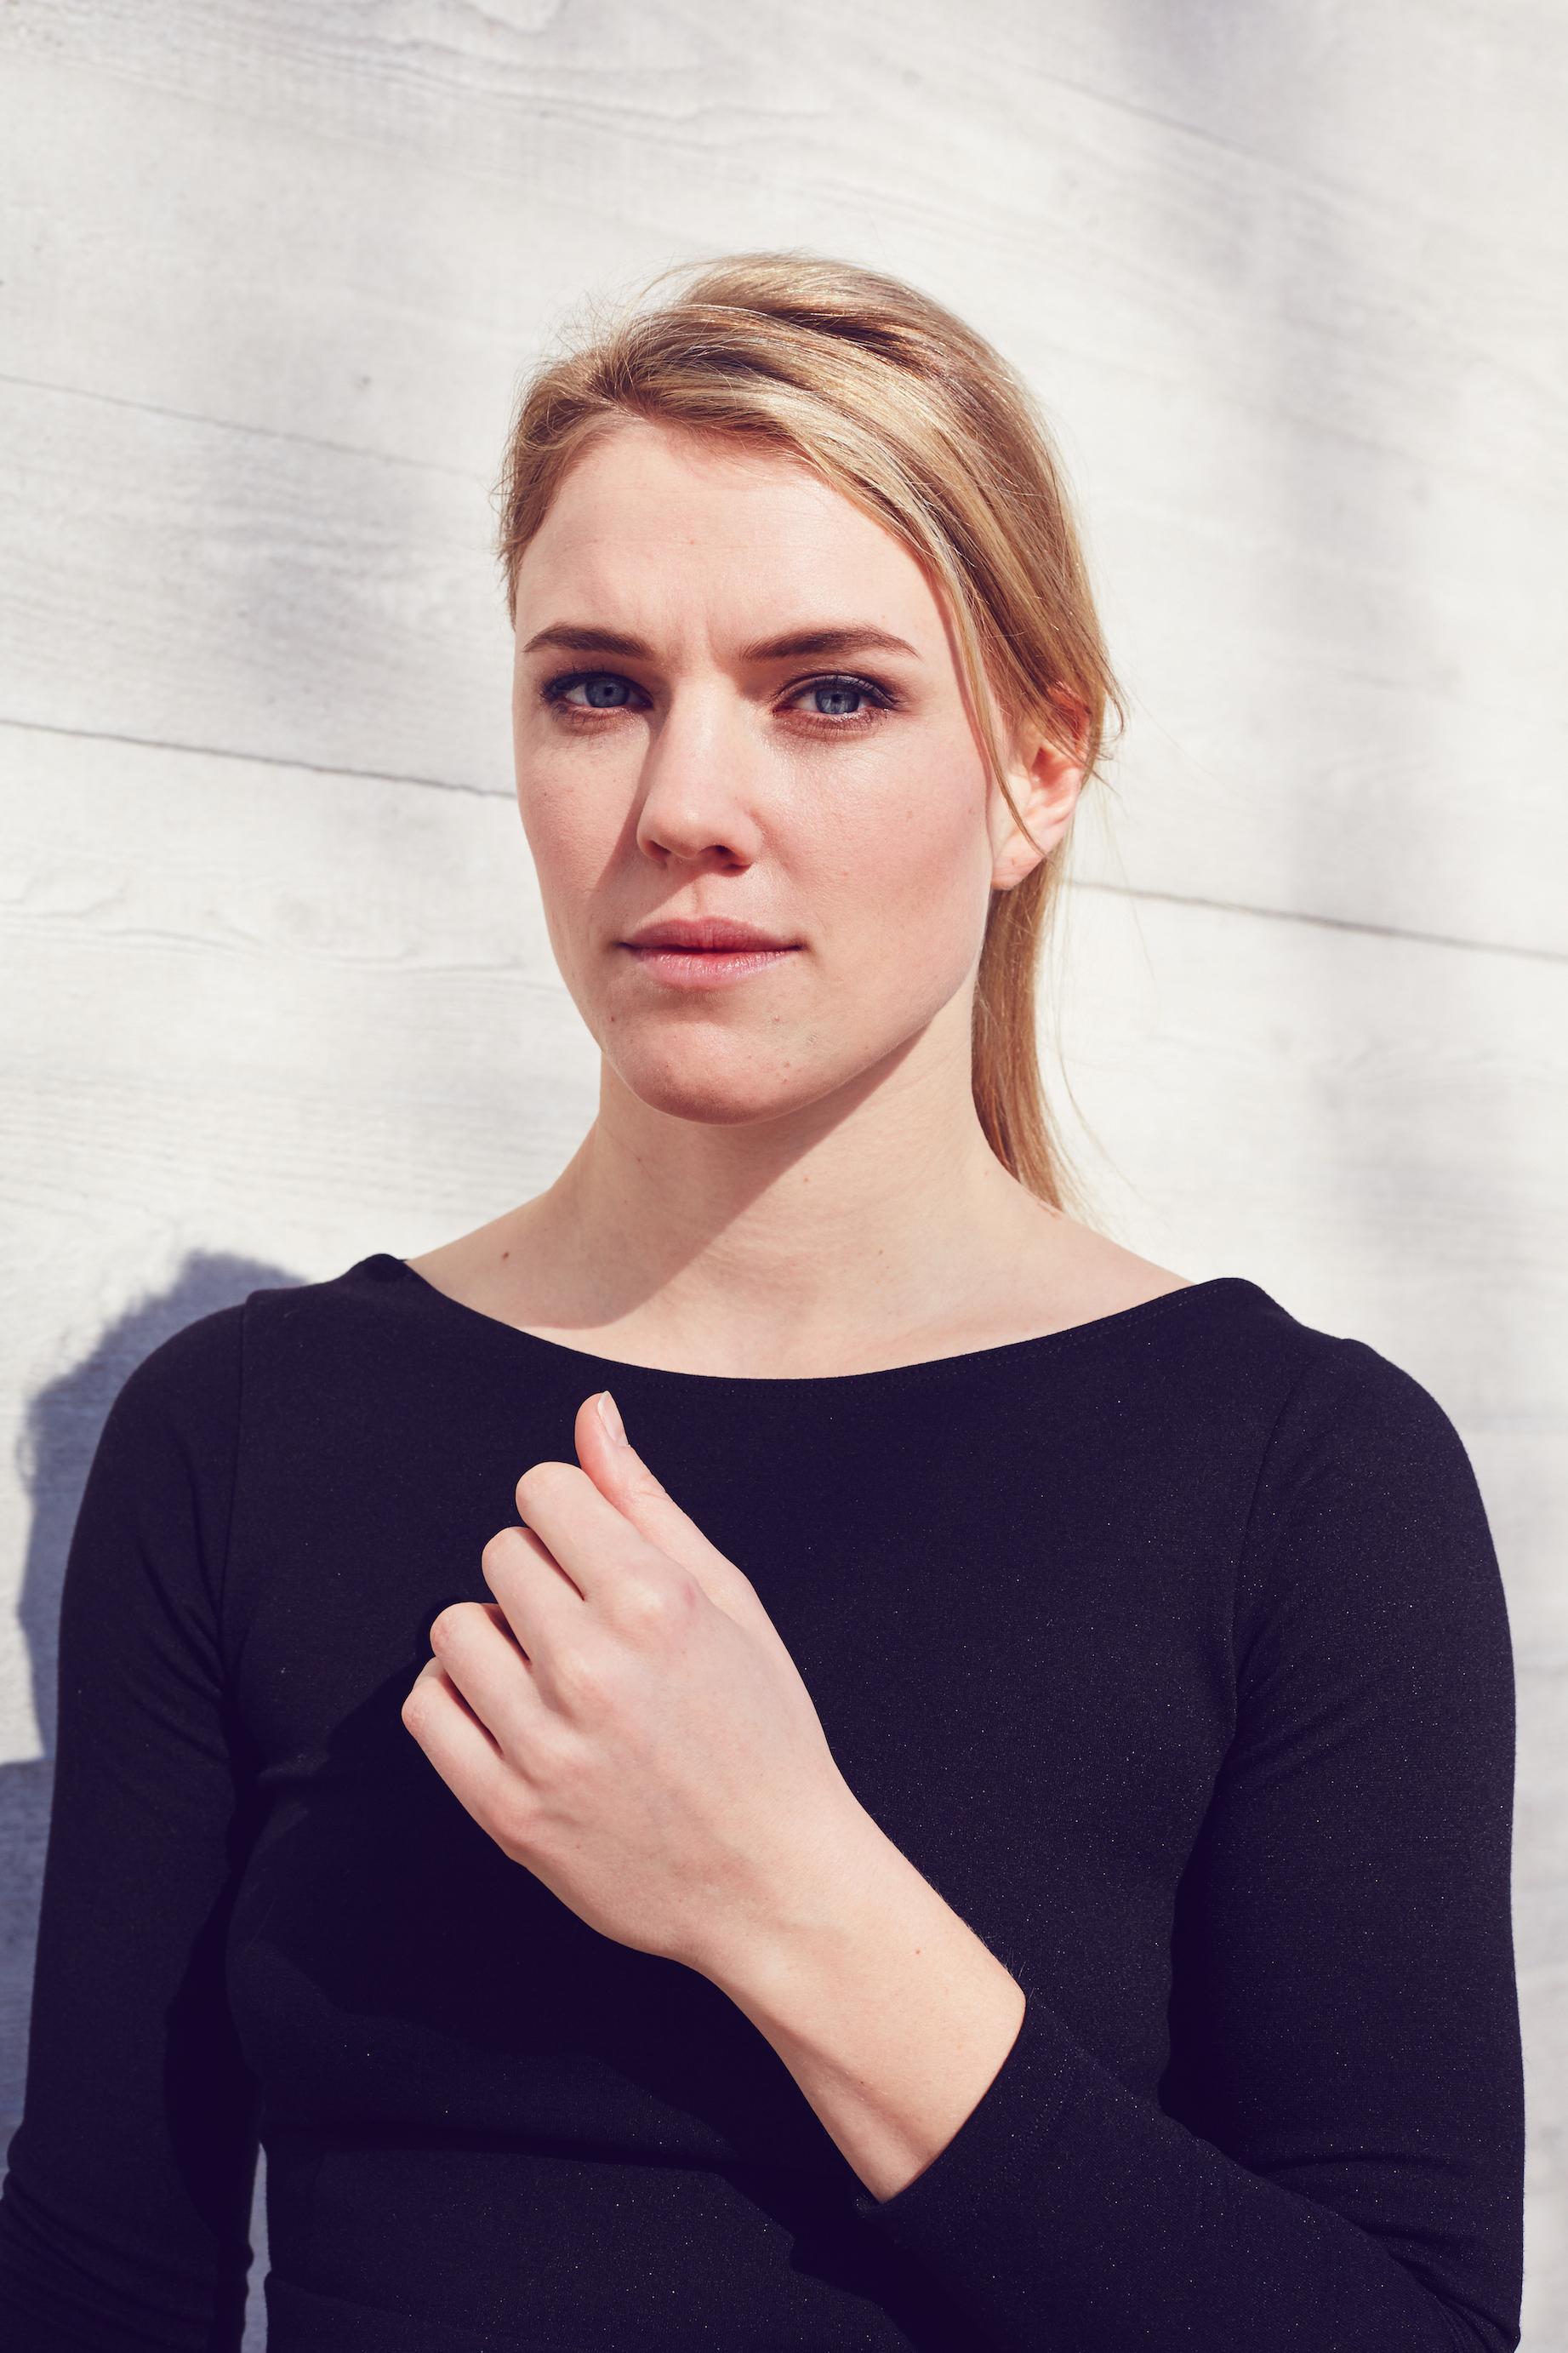 Mara Scherzinger